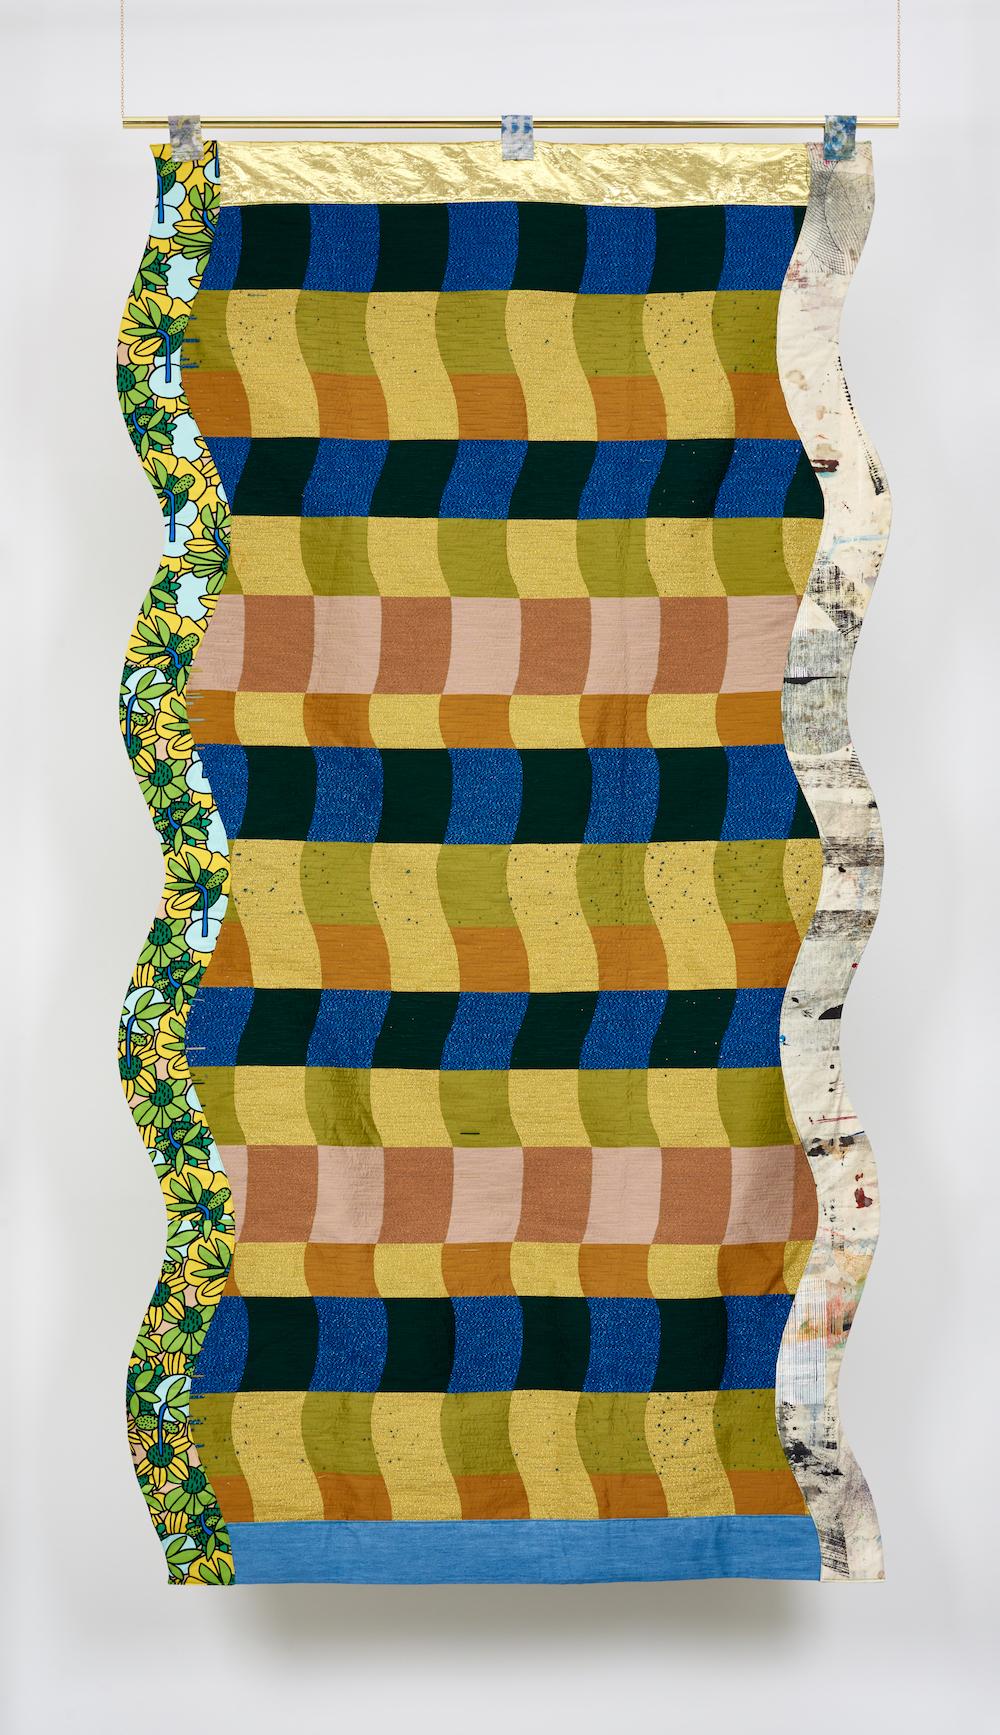 Ludovica Gioscia, Portal 21, 2019. Fabric, thread and metal pole. 231 x 122 cm. Photographer Jonathon Bassett.